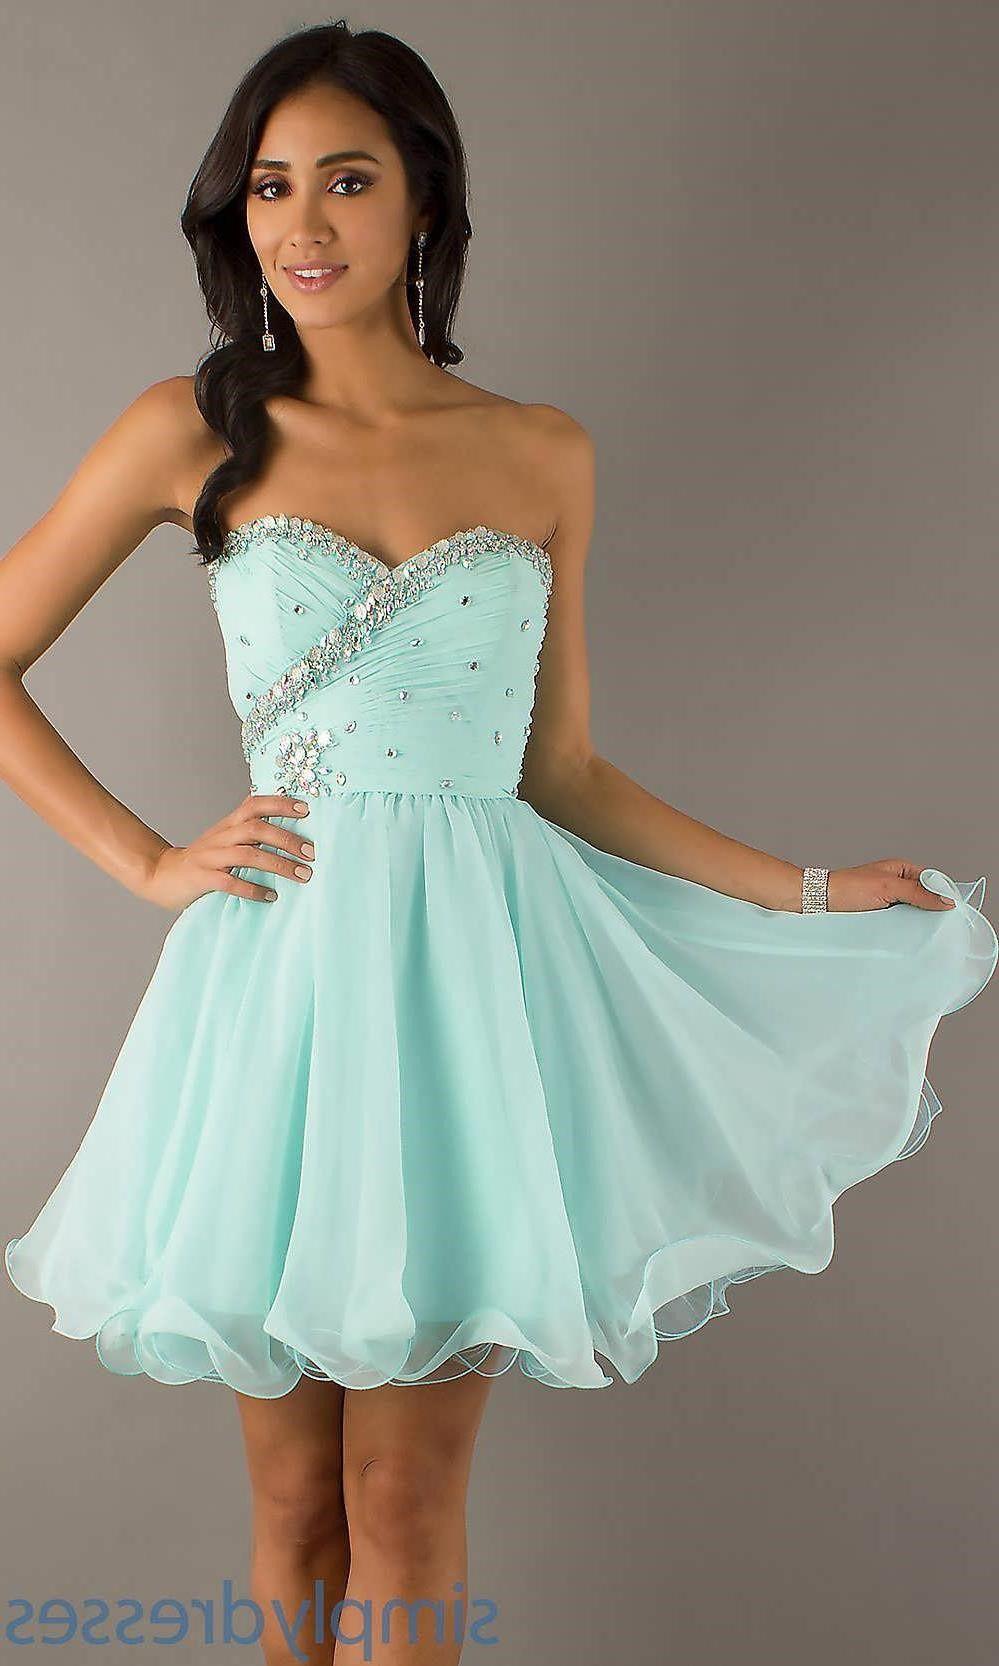 Black Semi Formal Dresses For Juniors | Dress Images | Dresses ...